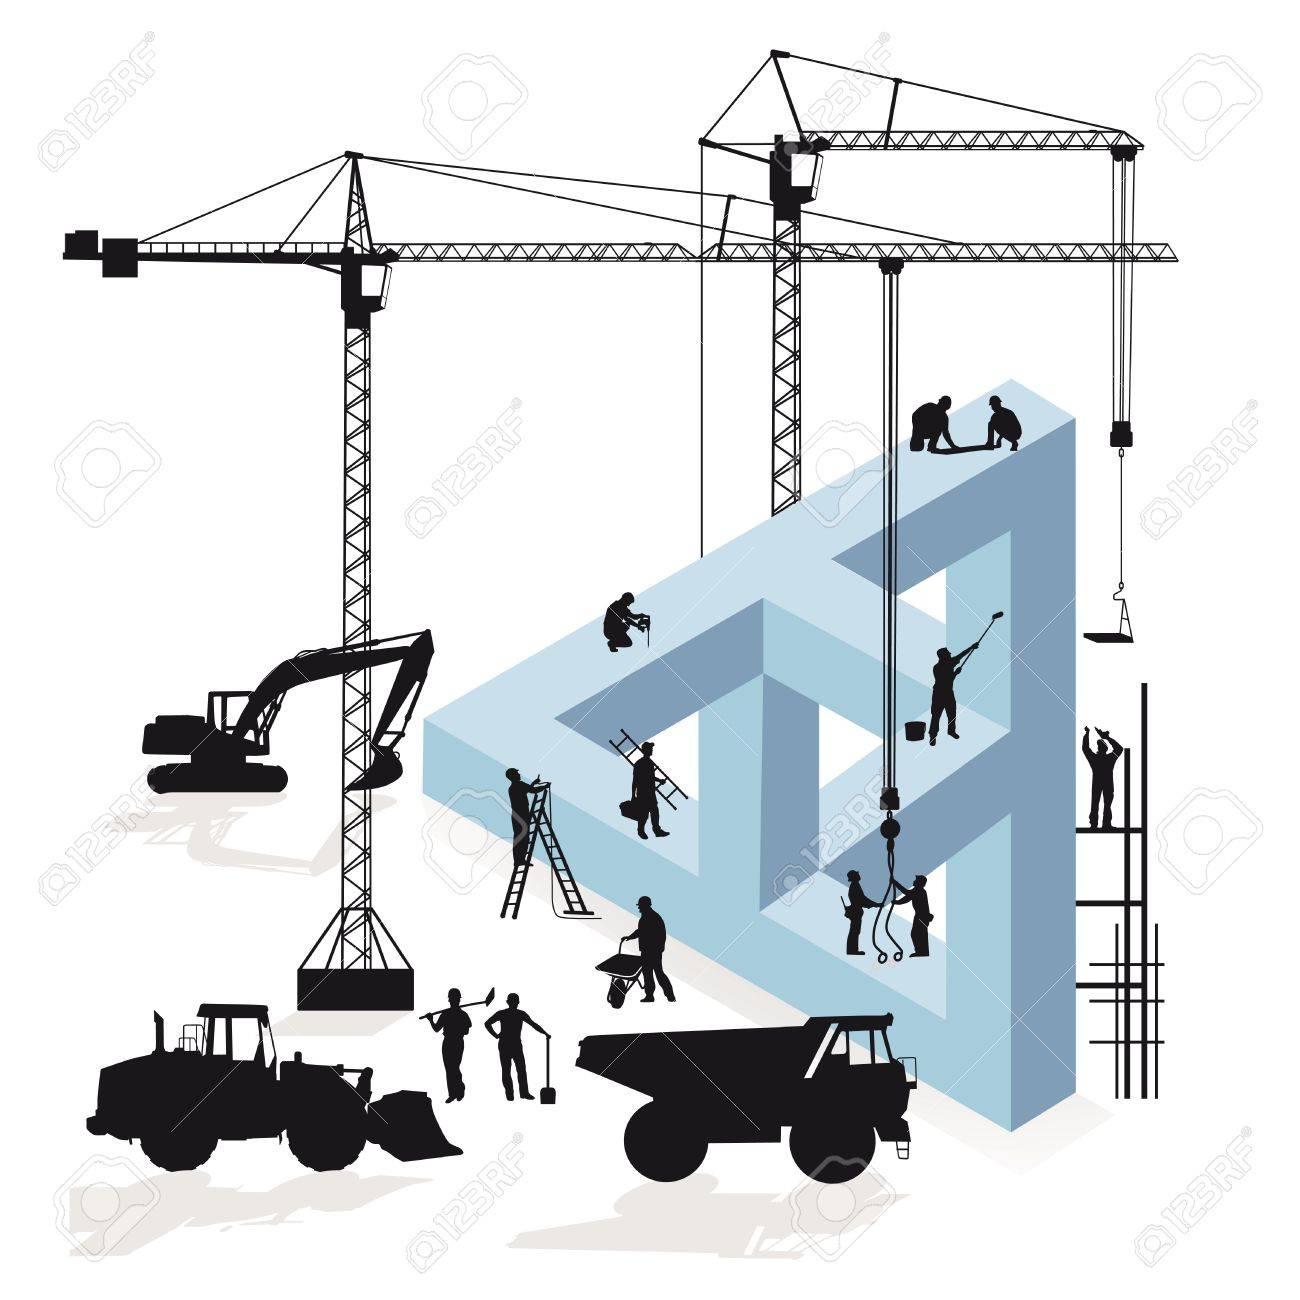 Magination Construction Stock Vector - 22176151